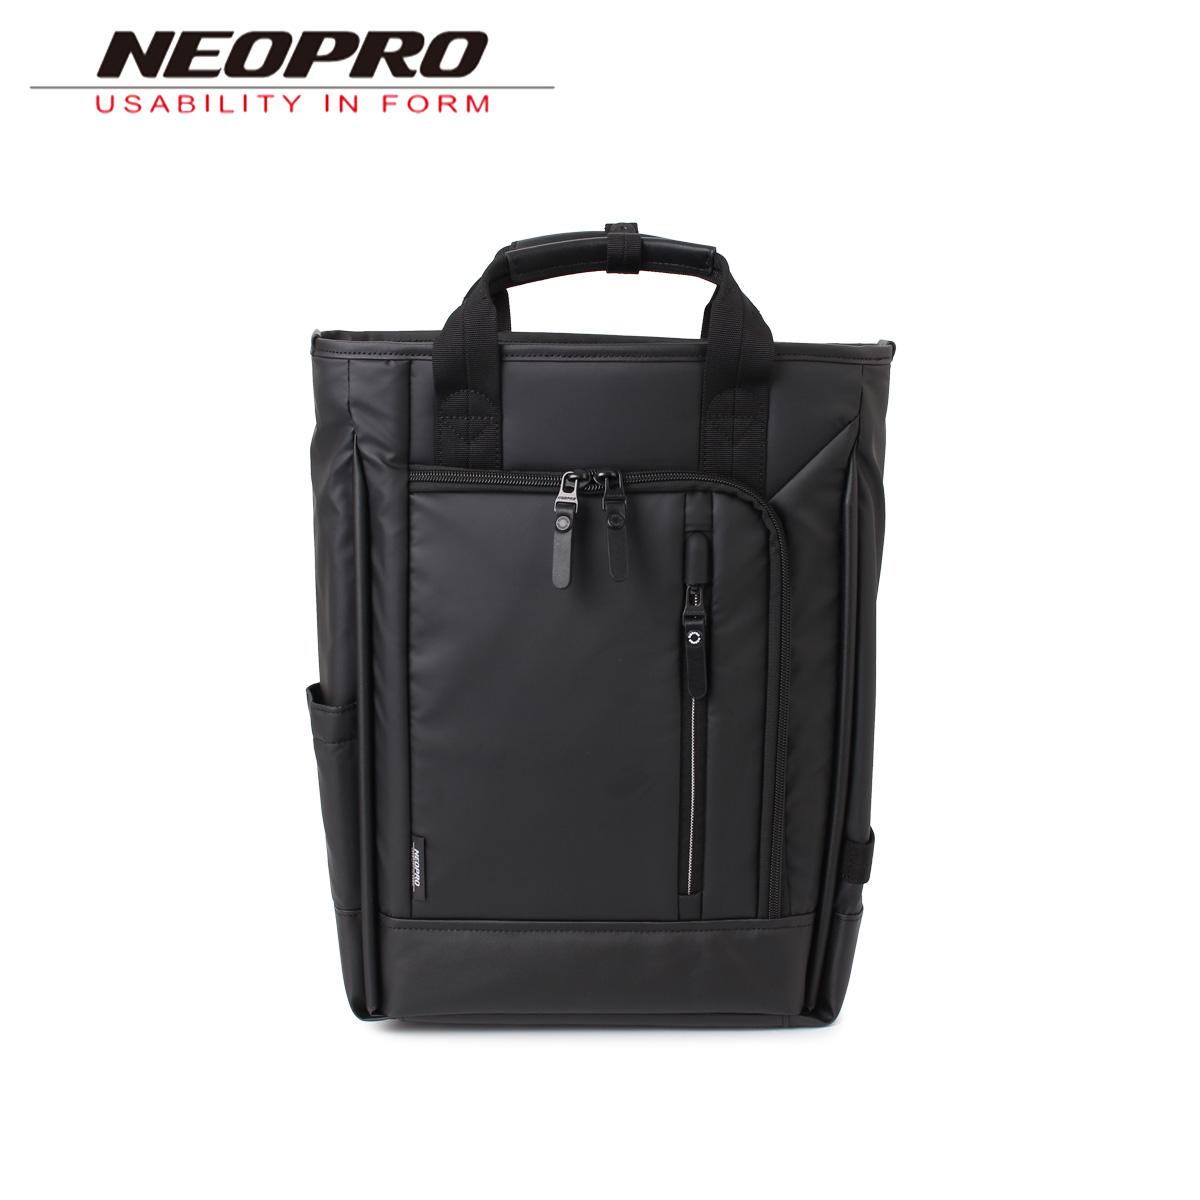 NEOPRO RED ネオプロ リュック バック バックパック ビジネスバッグ トート メンズ 2WAY ブラック 黒 2-764 [11/27 新入荷]